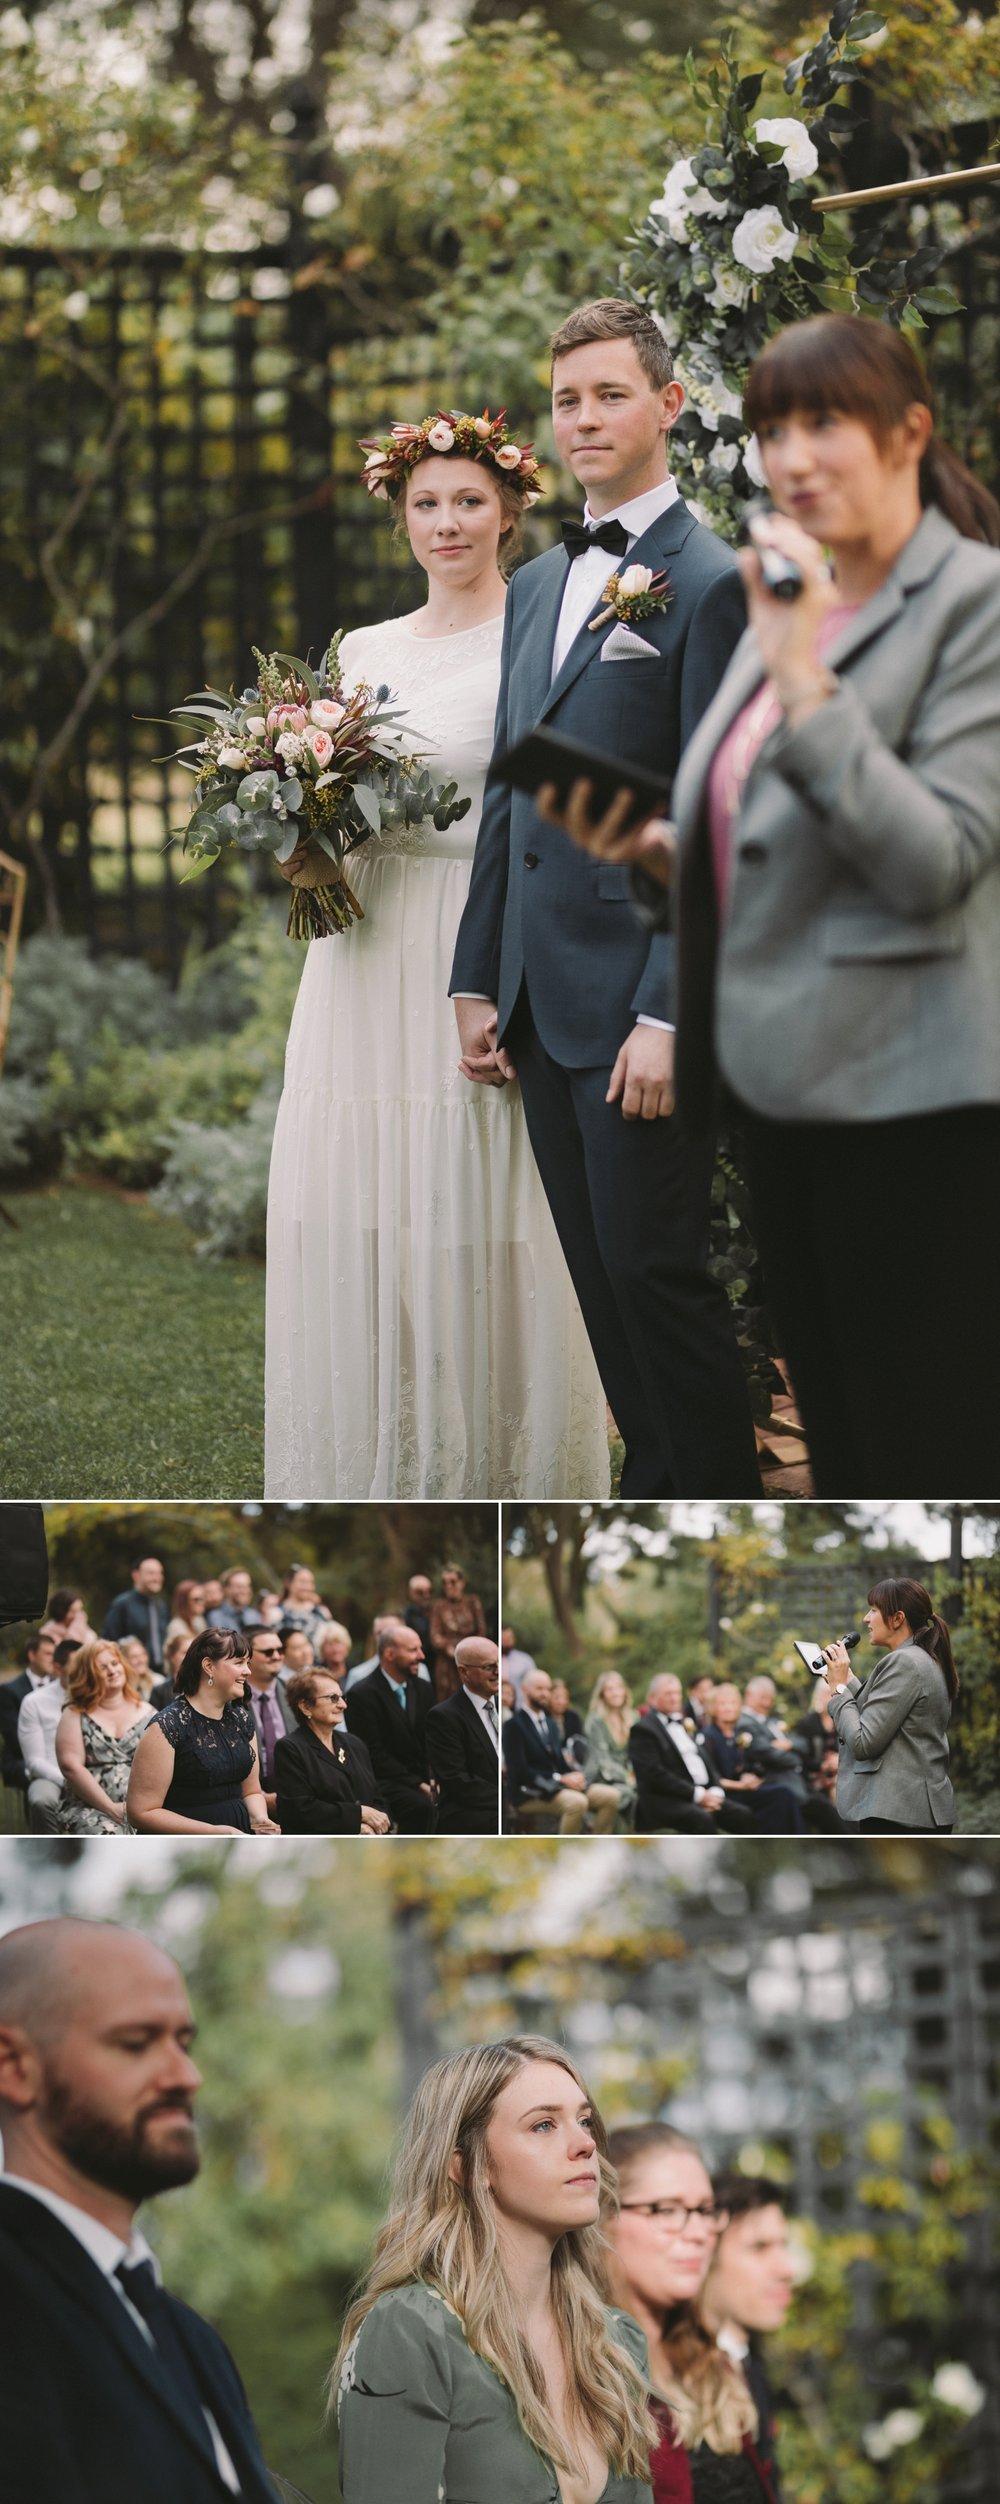 Jo & Aaron - Natural Wedding Photography in Adelaide - Beautiful, modern wedding photographer - Al Ru Farm Wedding Photography - Katherine Schultz_0017.jpg